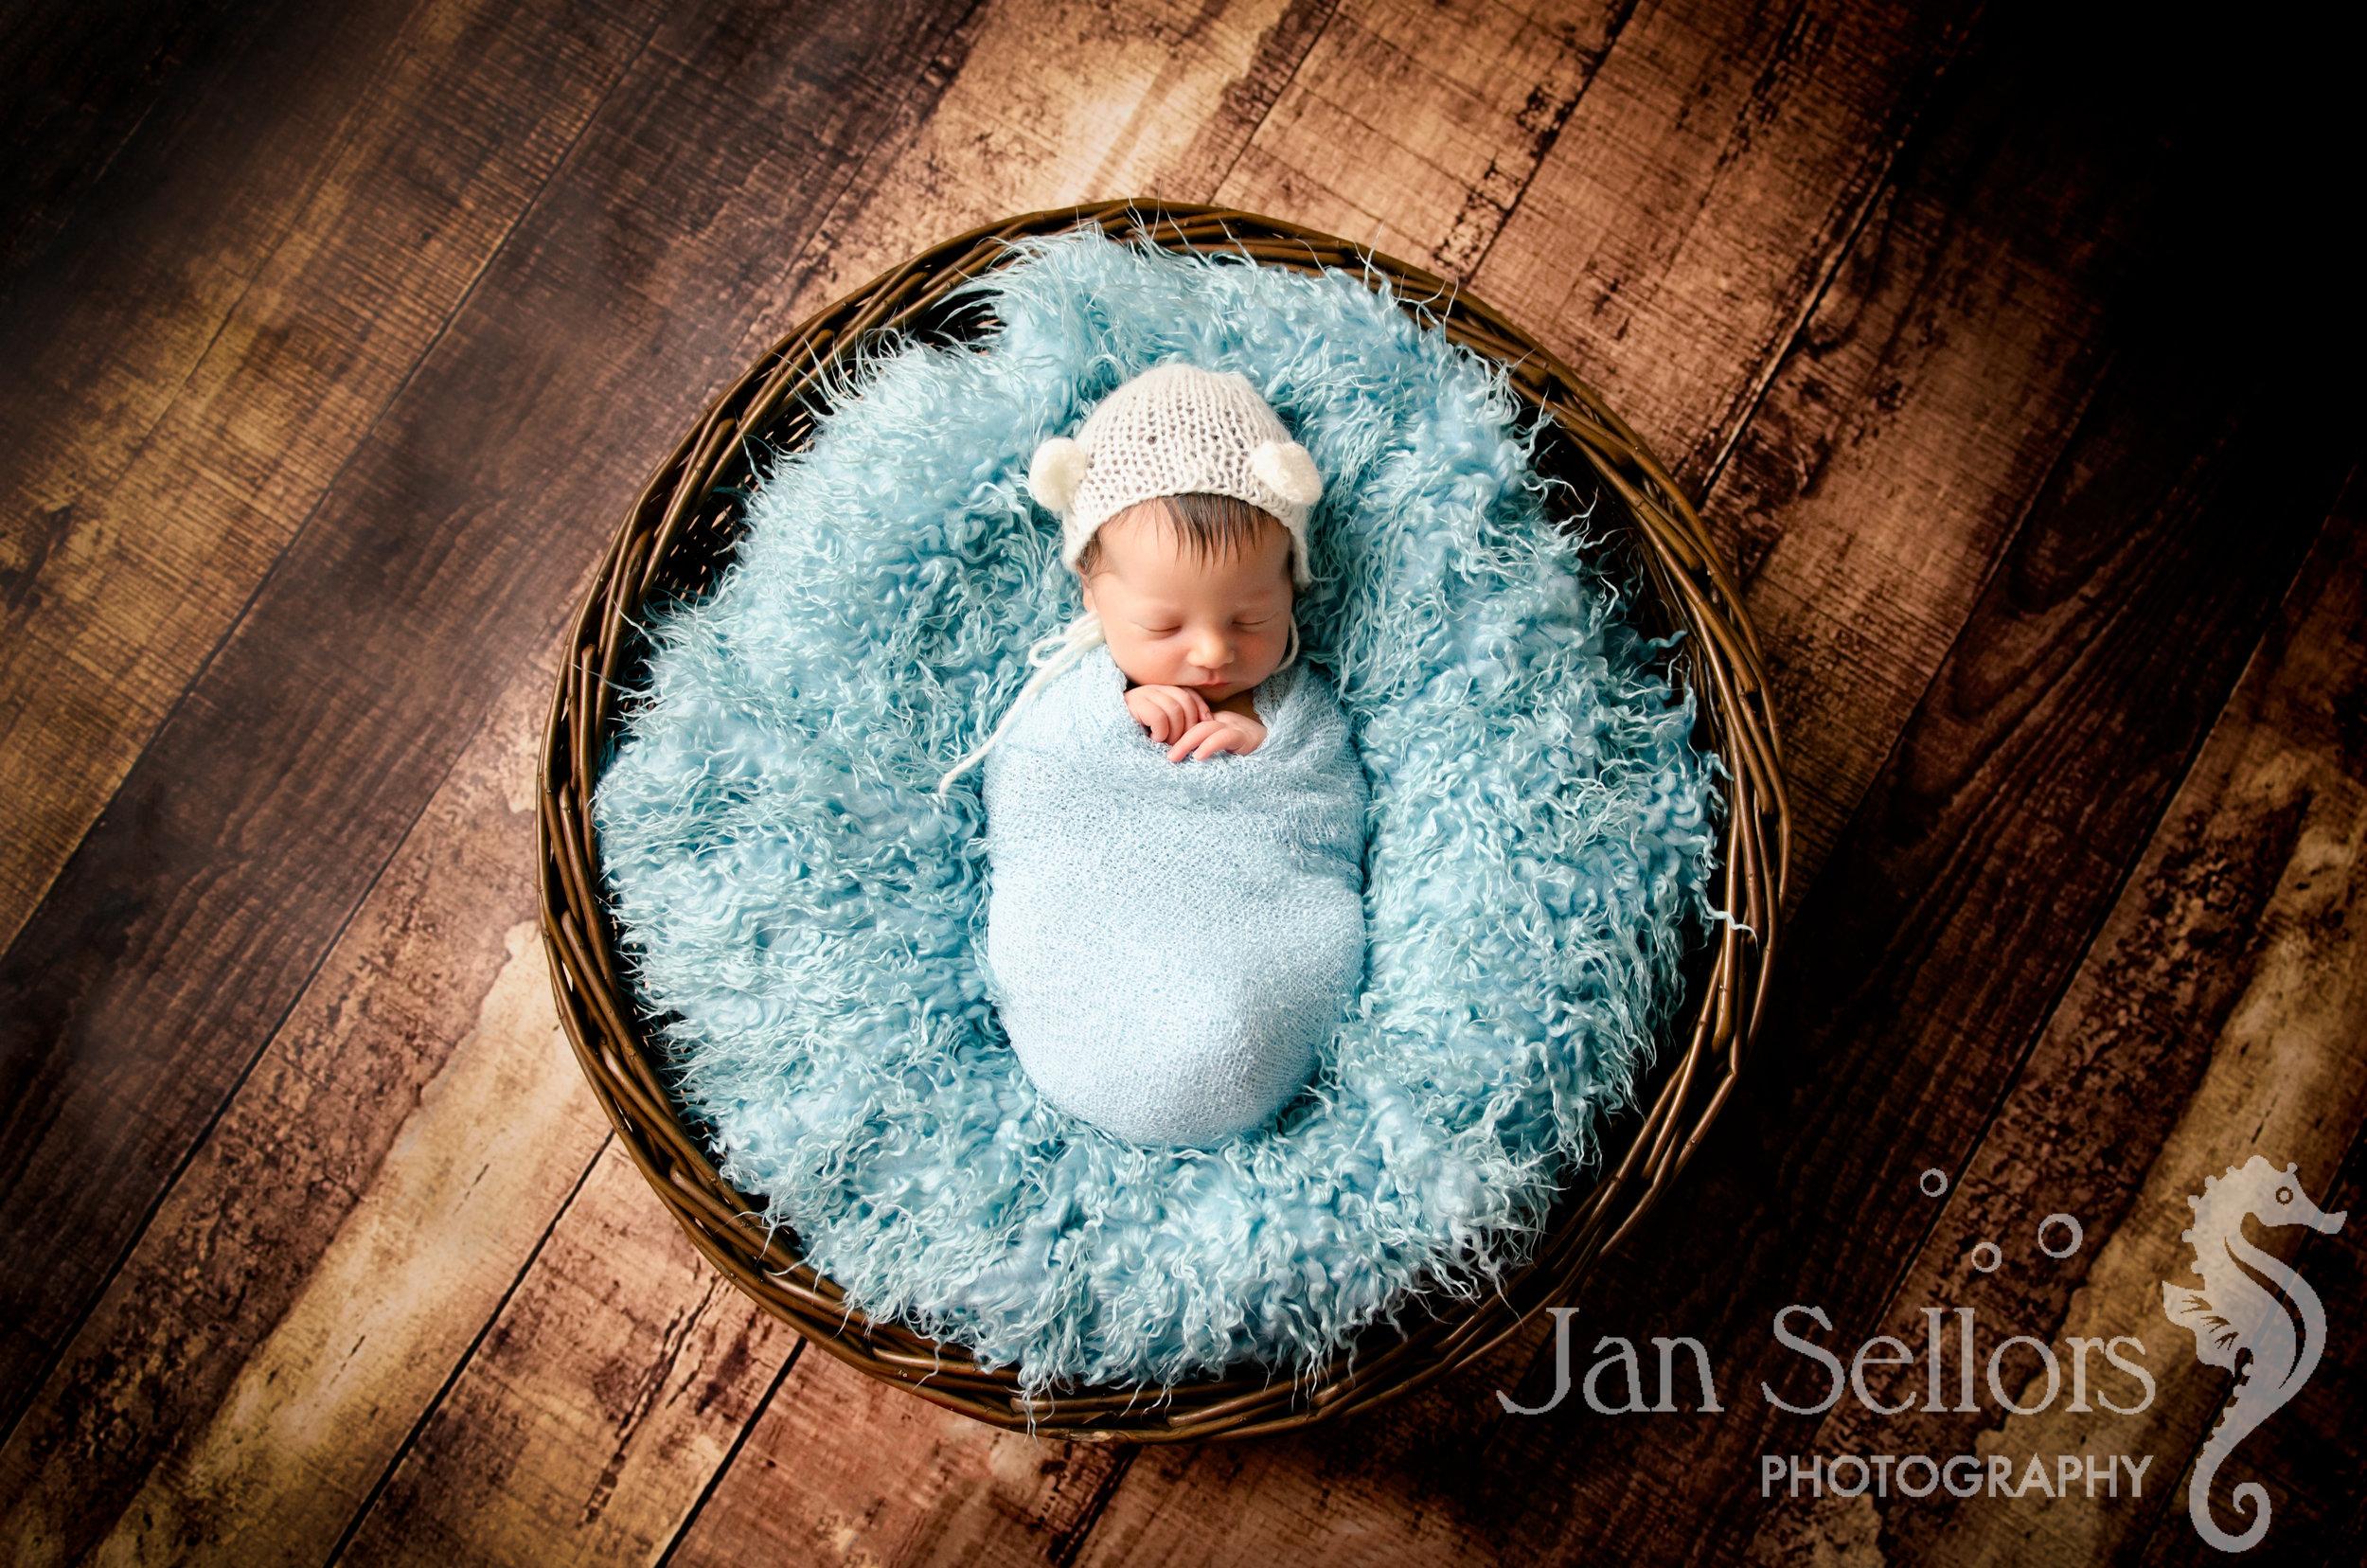 JanSellorsPhotography,newborn photography isle of man baby photography isle of man baby photos isle of man newborn photographer isle of man baby photographer isle of man-1.jpg